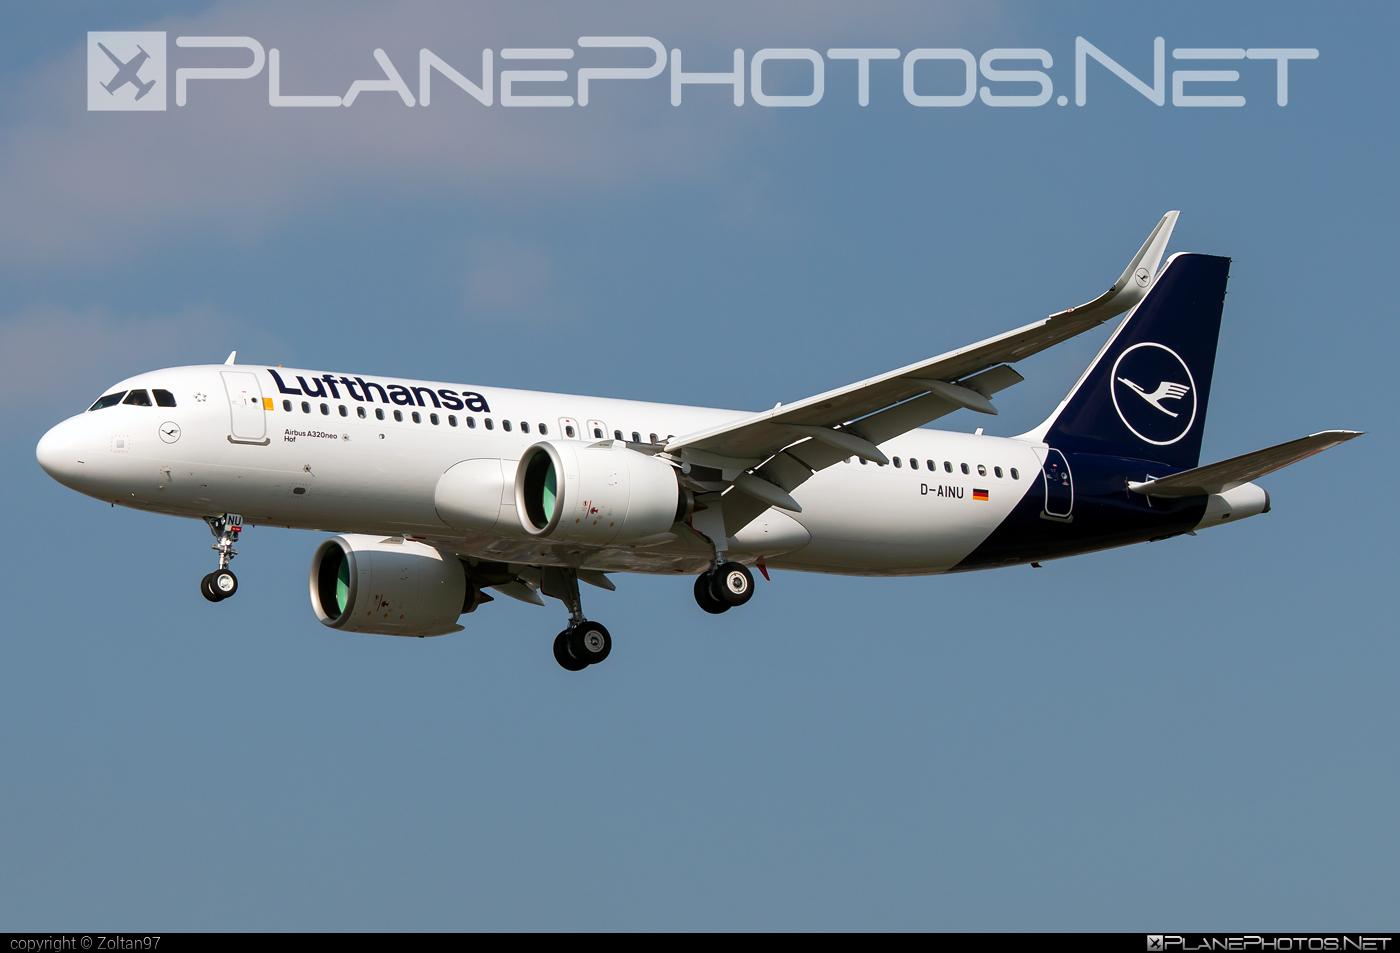 Airbus A320-271N - D-AINU operated by Lufthansa #a320 #a320family #a320neo #airbus #airbus320 #lufthansa